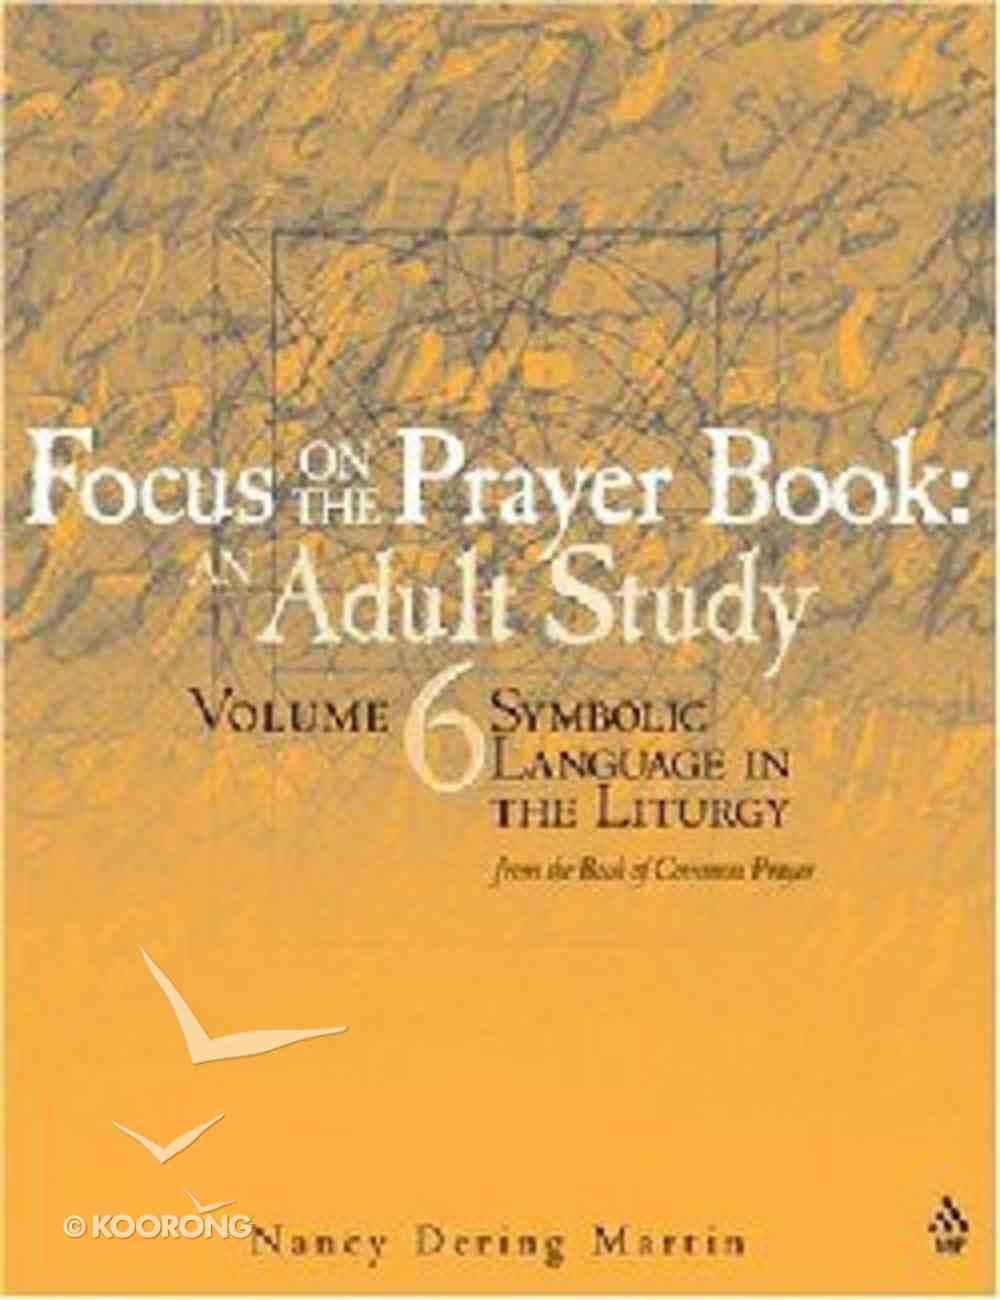 Symbolic Language in the Liturgy (Focus On The Prayer Book Series) Paperback